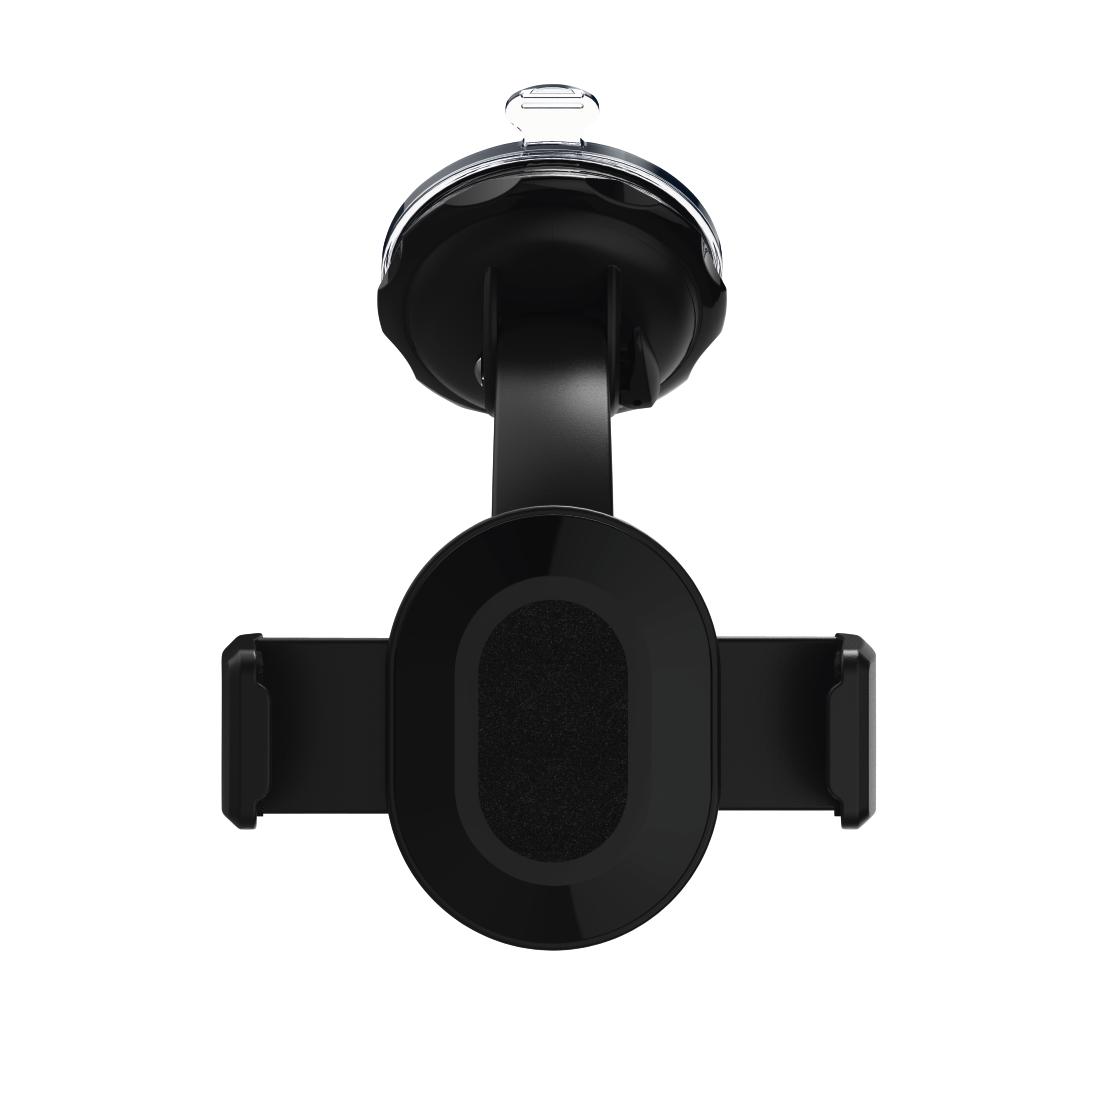 00173896 hama uni smartphone halter ger te mit breite 5 5 8 5 cm mit saugnapf hama de. Black Bedroom Furniture Sets. Home Design Ideas